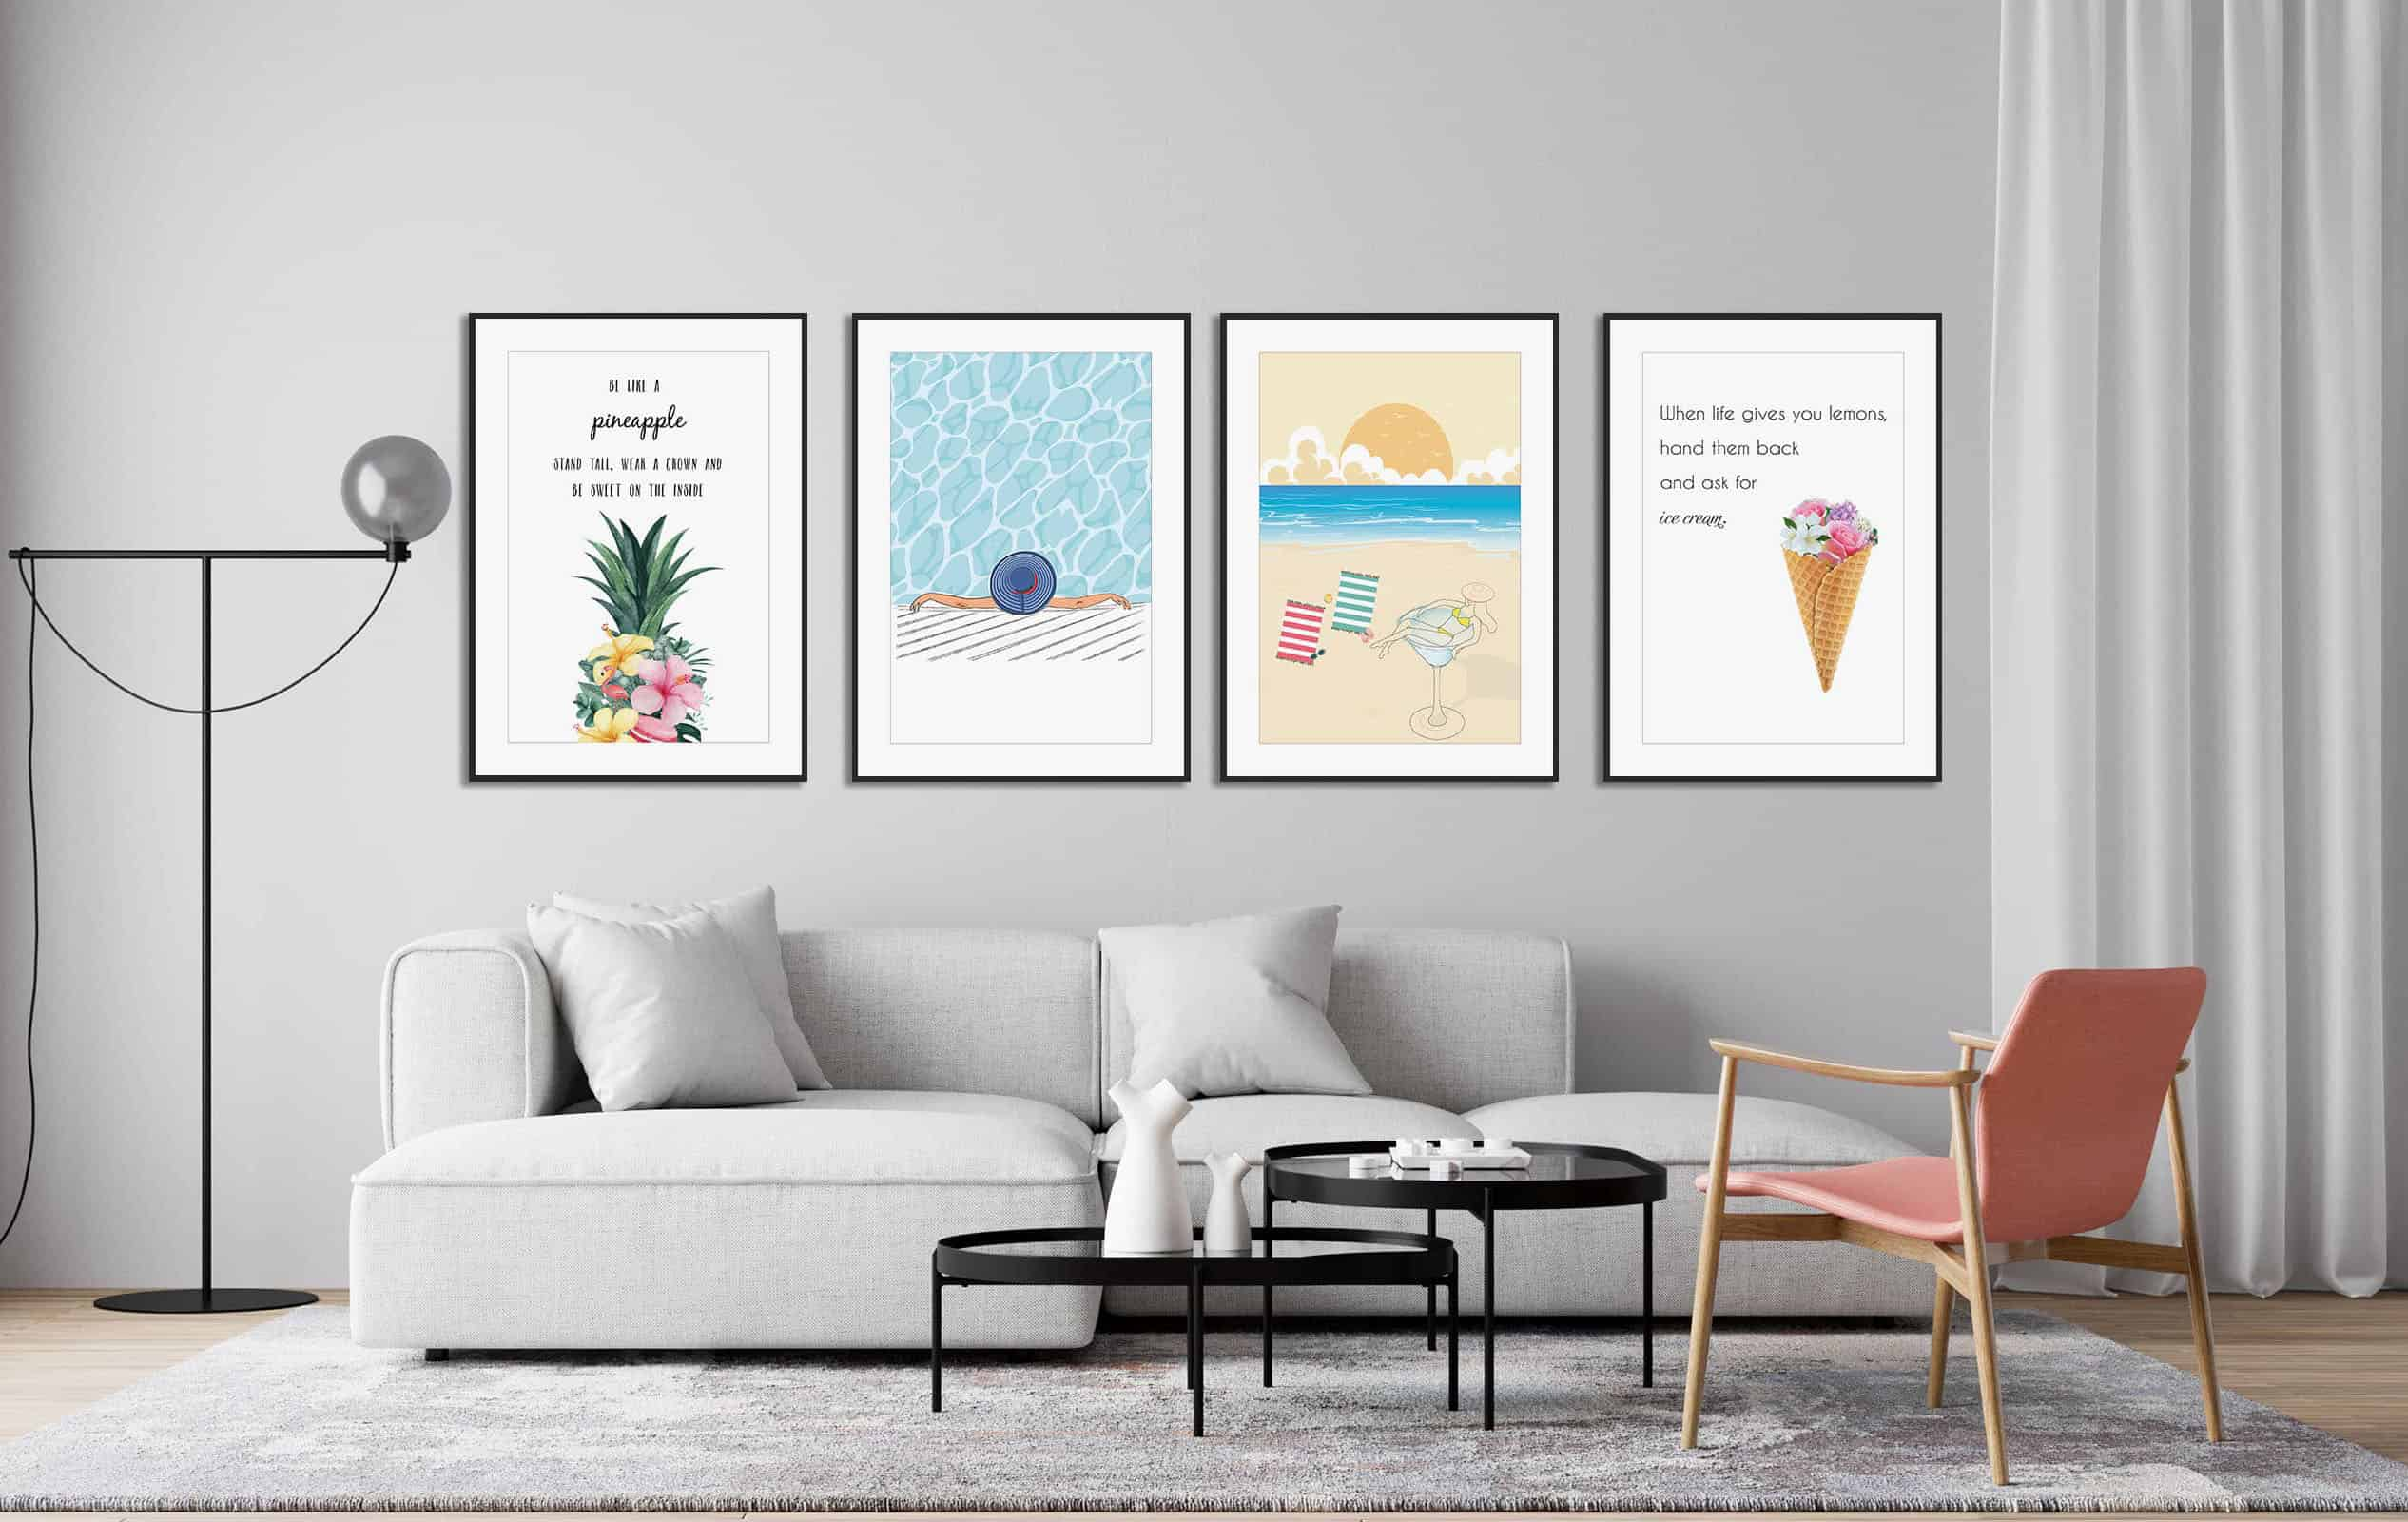 Ivy Qui Design posteri na zidu u dnevnoj sobi